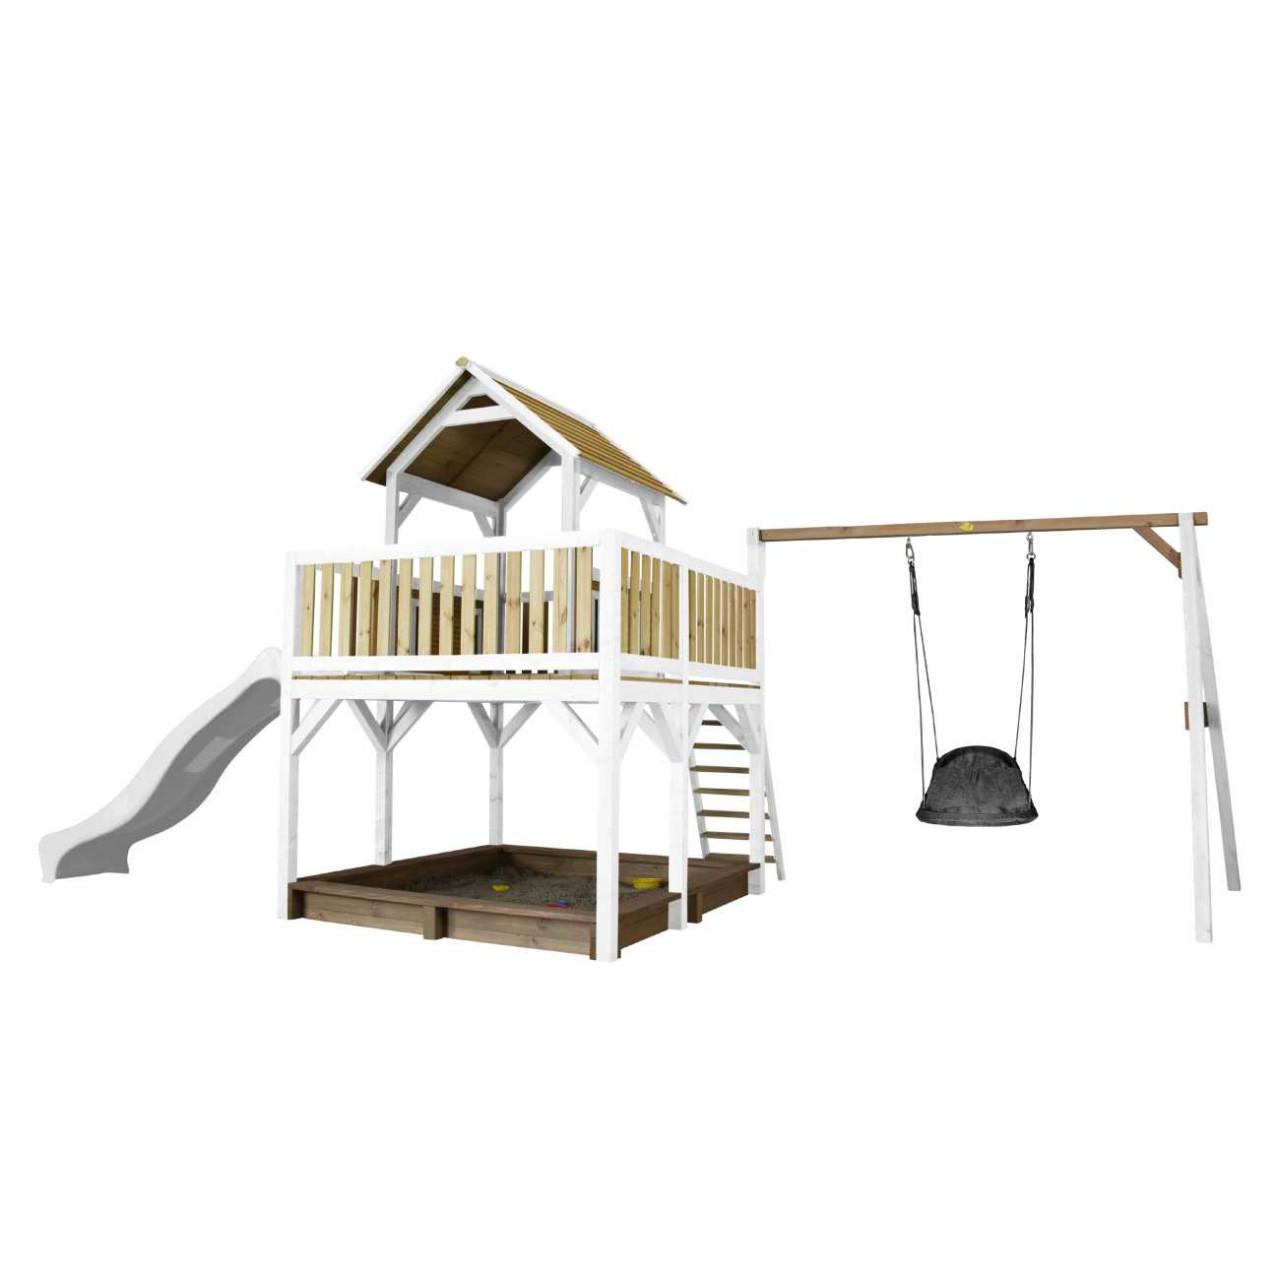 Spielturm Atka mit Nestschaukel Grandoh, Axi Spielturm, Kinder